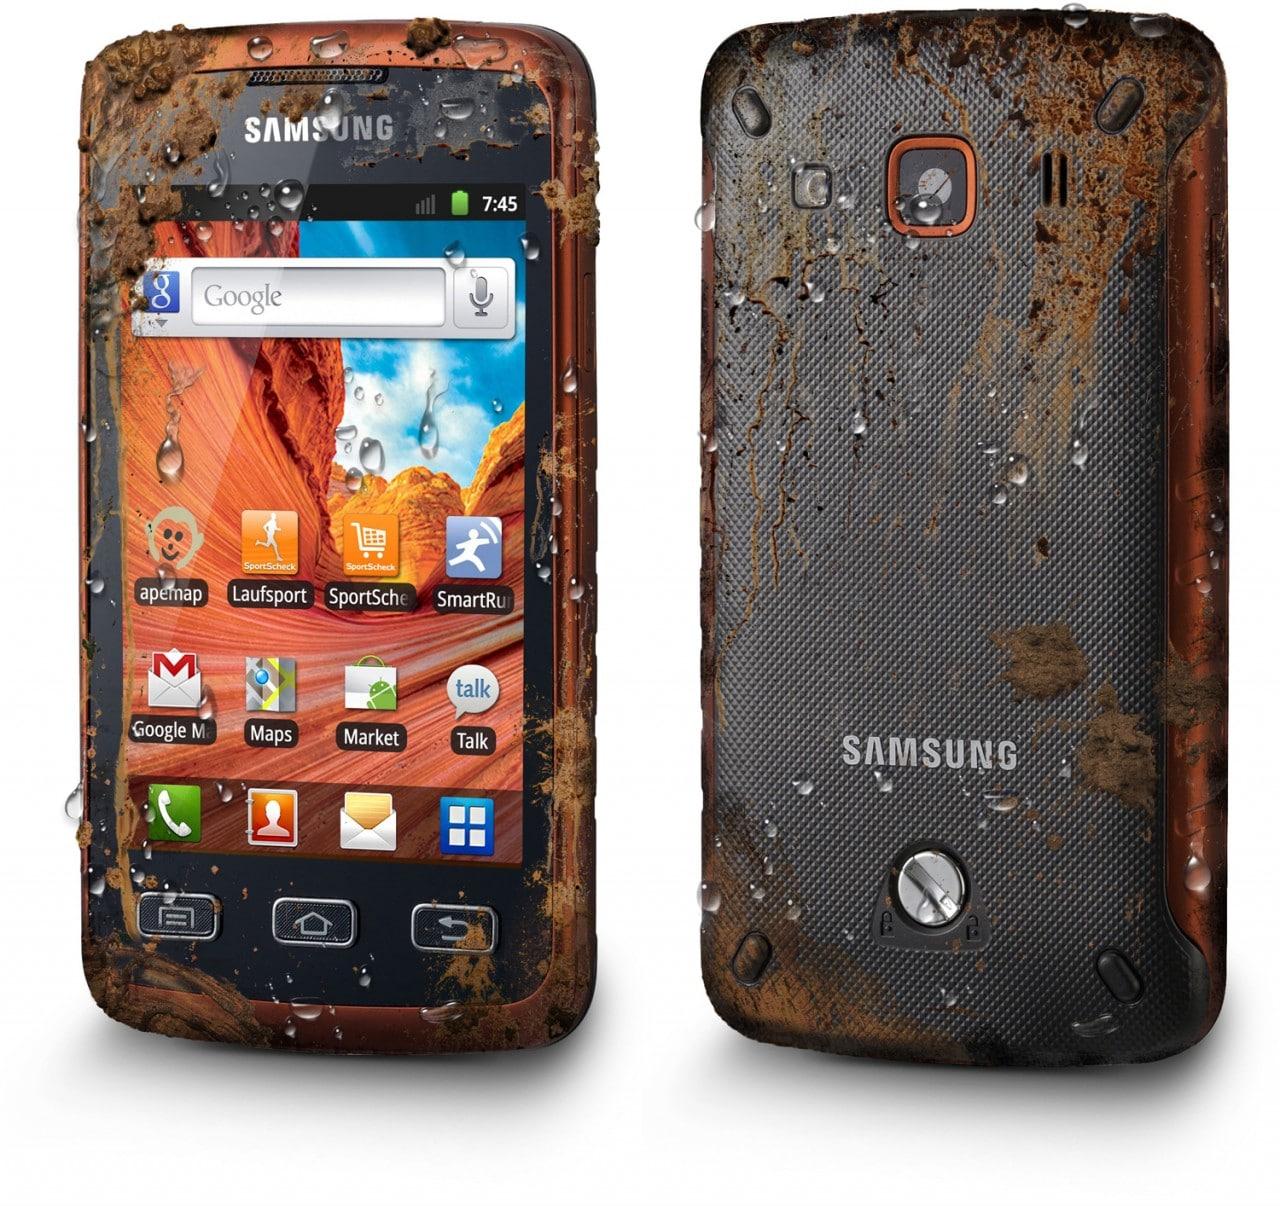 Samsung-Galaxy-Xcover-S5690